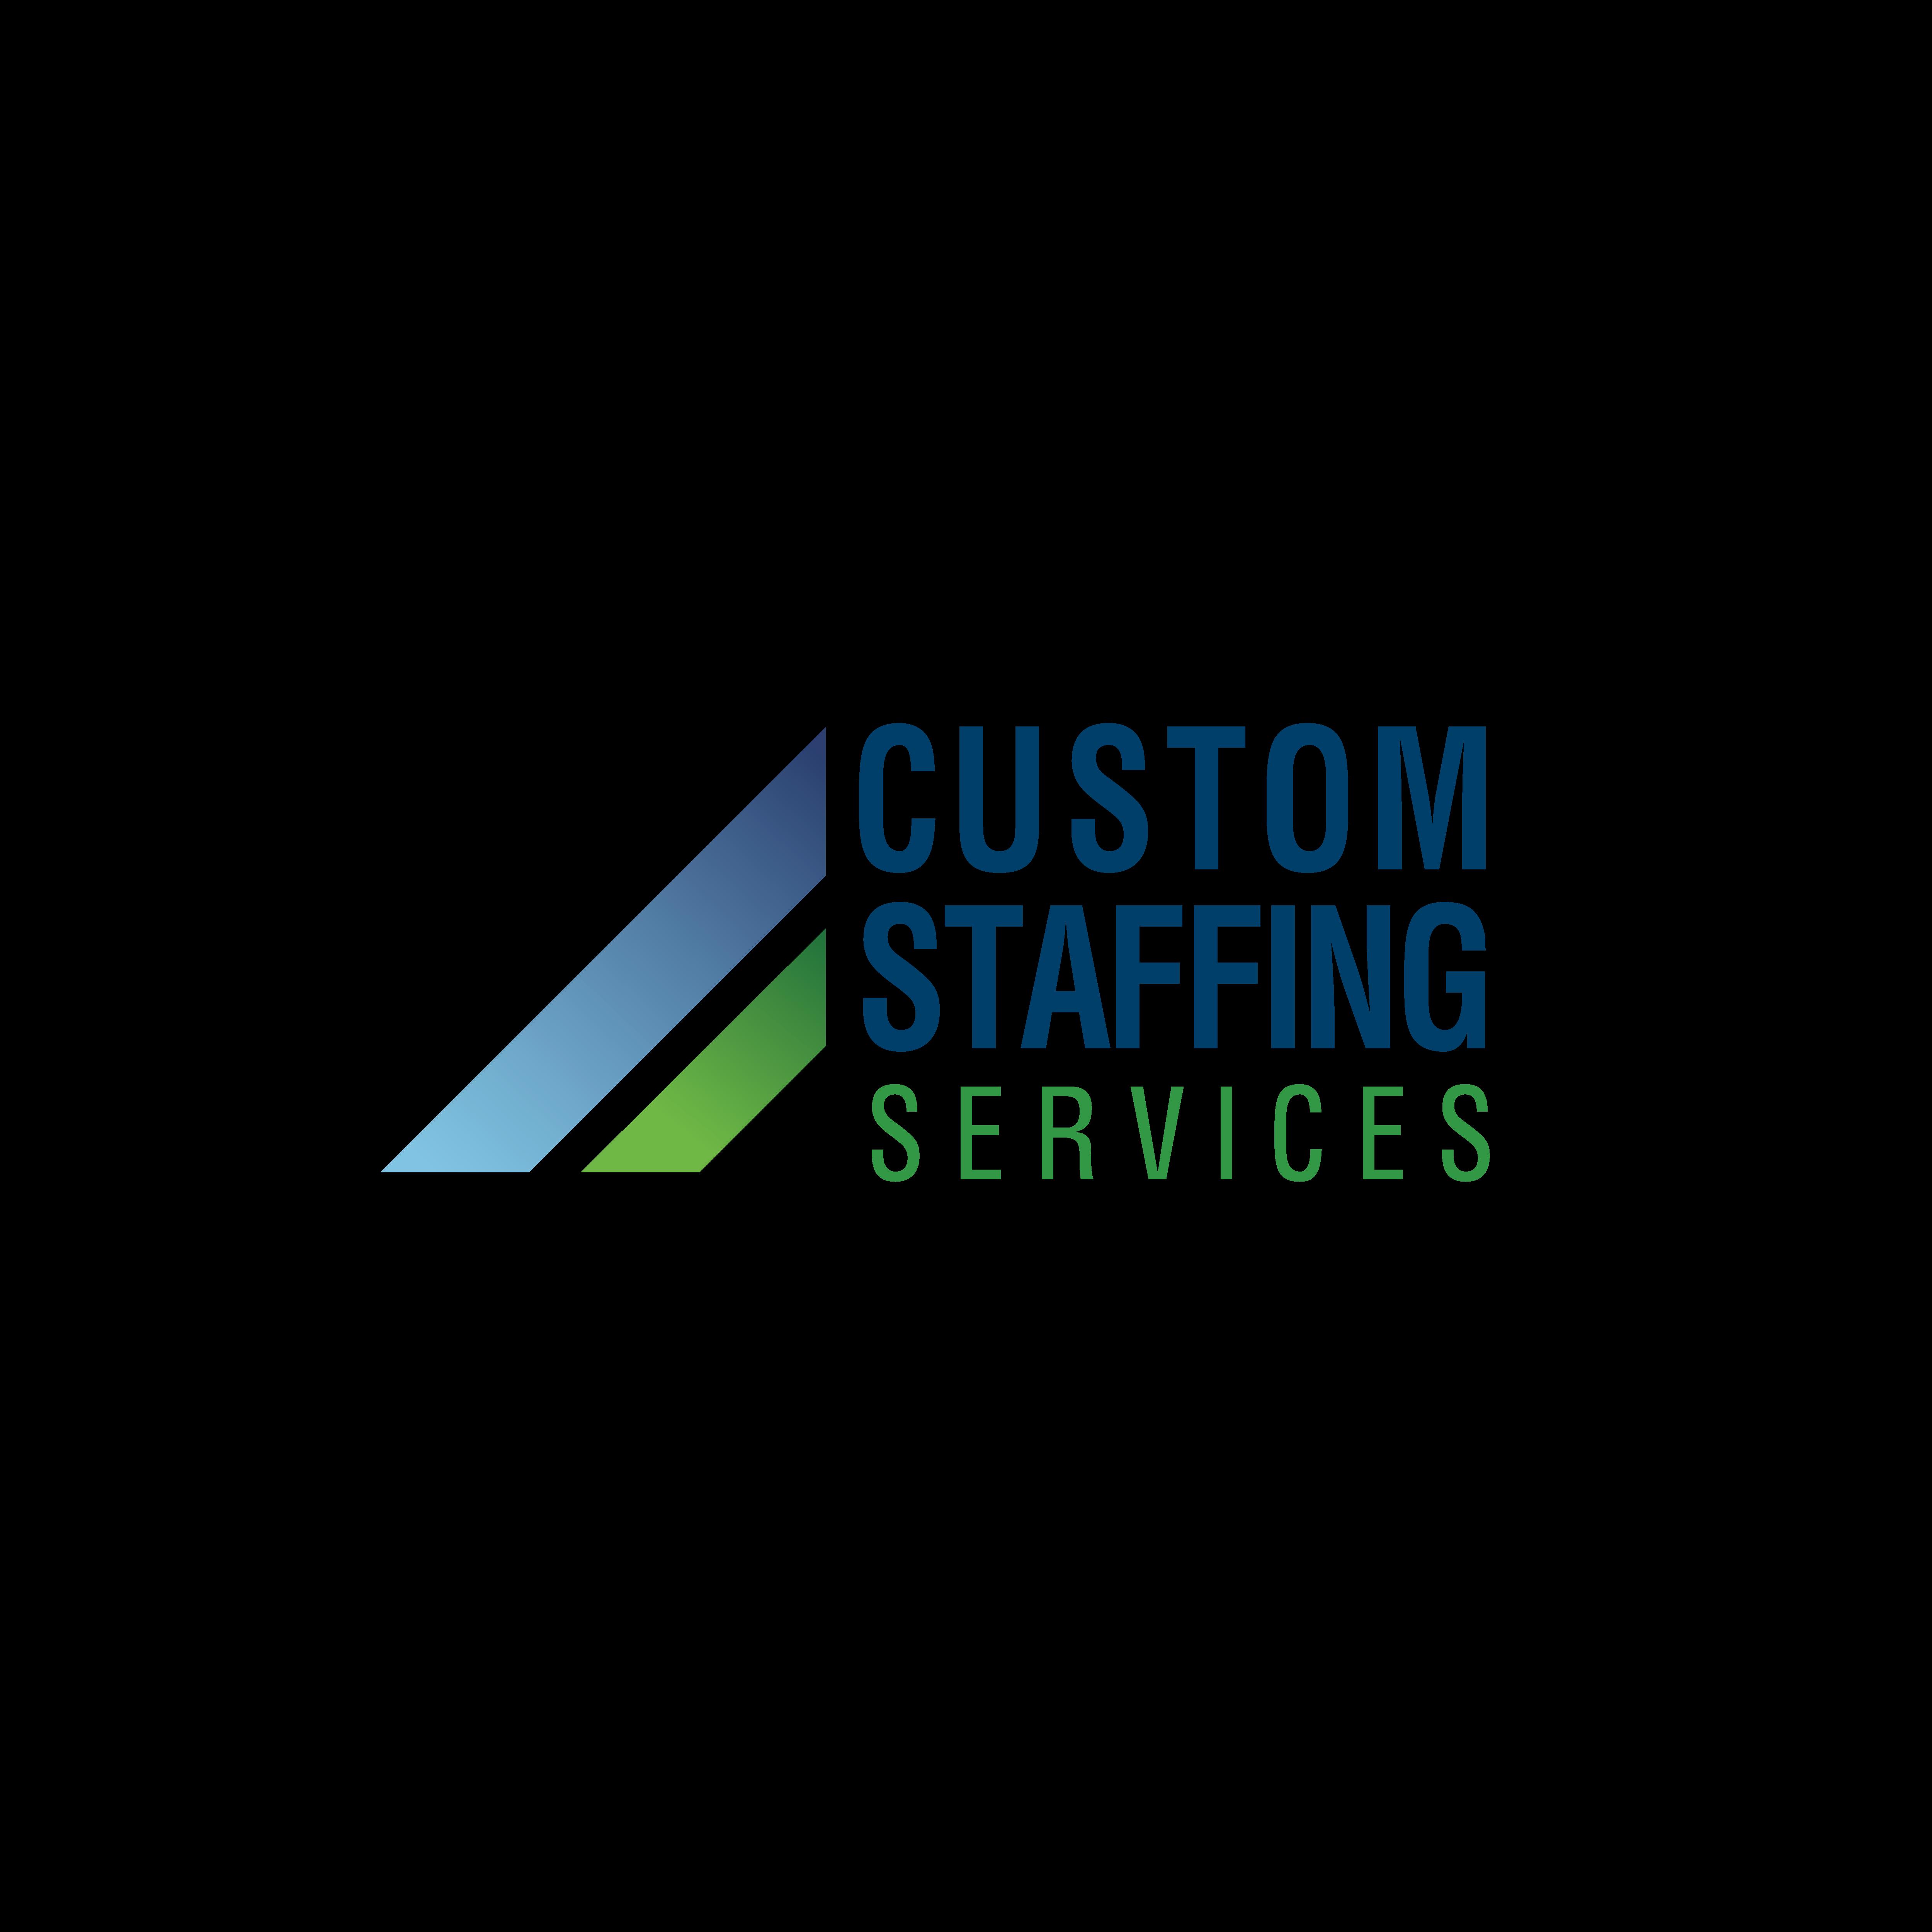 Custom Staffing - Evansville, IN 47715 - (812)213-7783 | ShowMeLocal.com